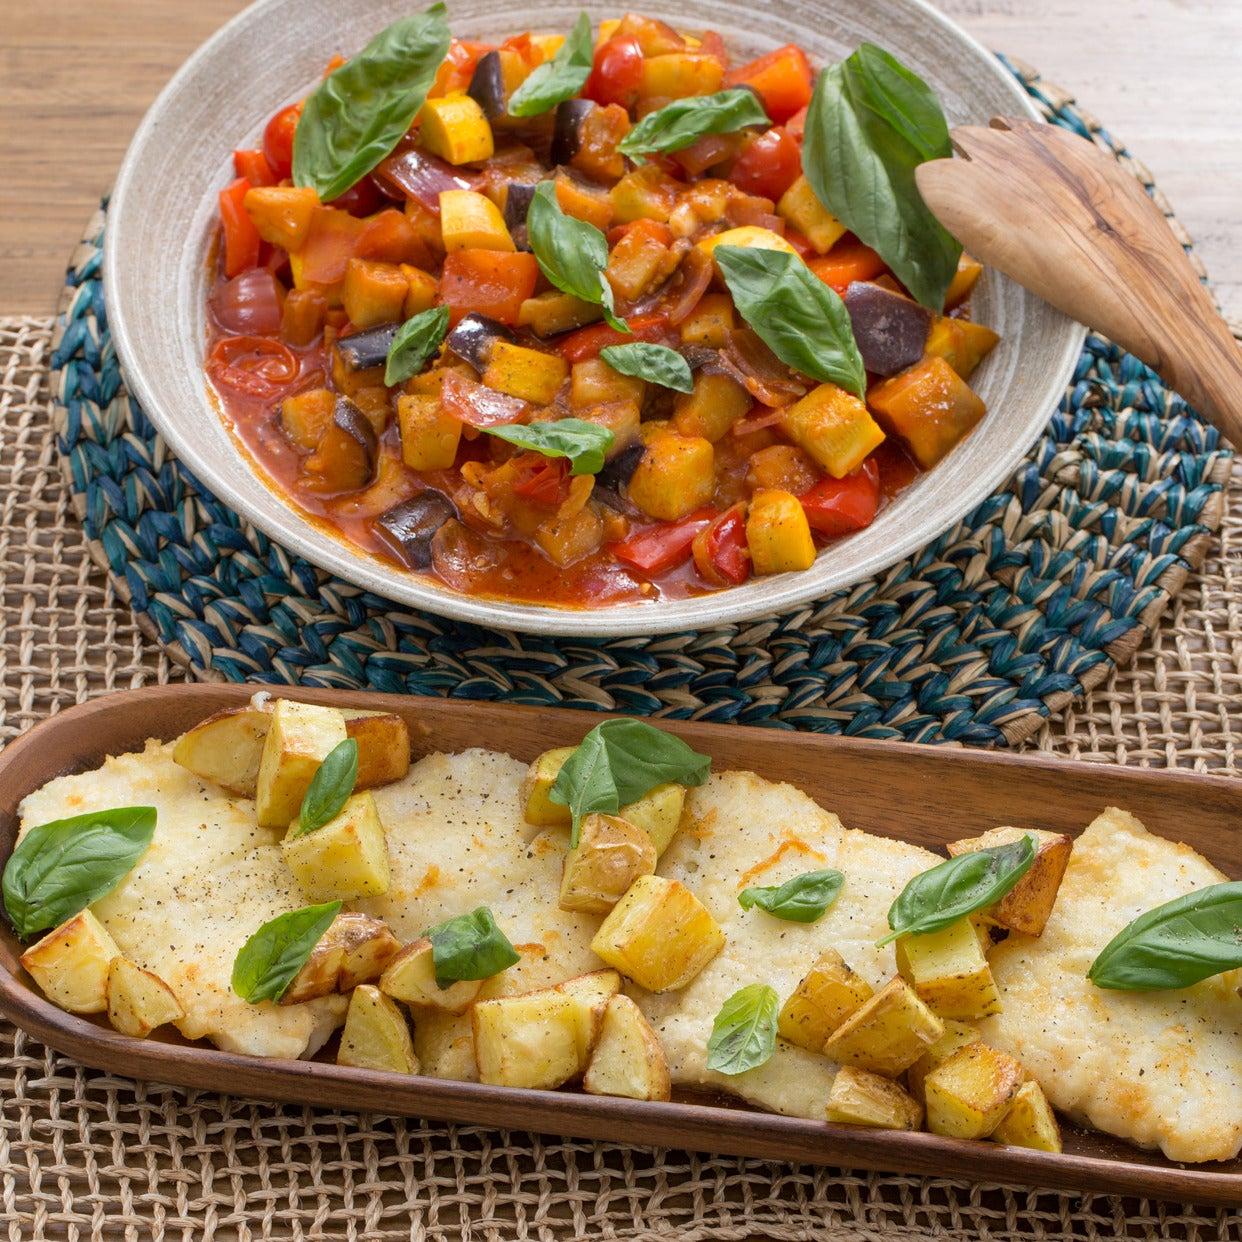 Cod & Summer Squash Ratatouille with Roasted Potatoes